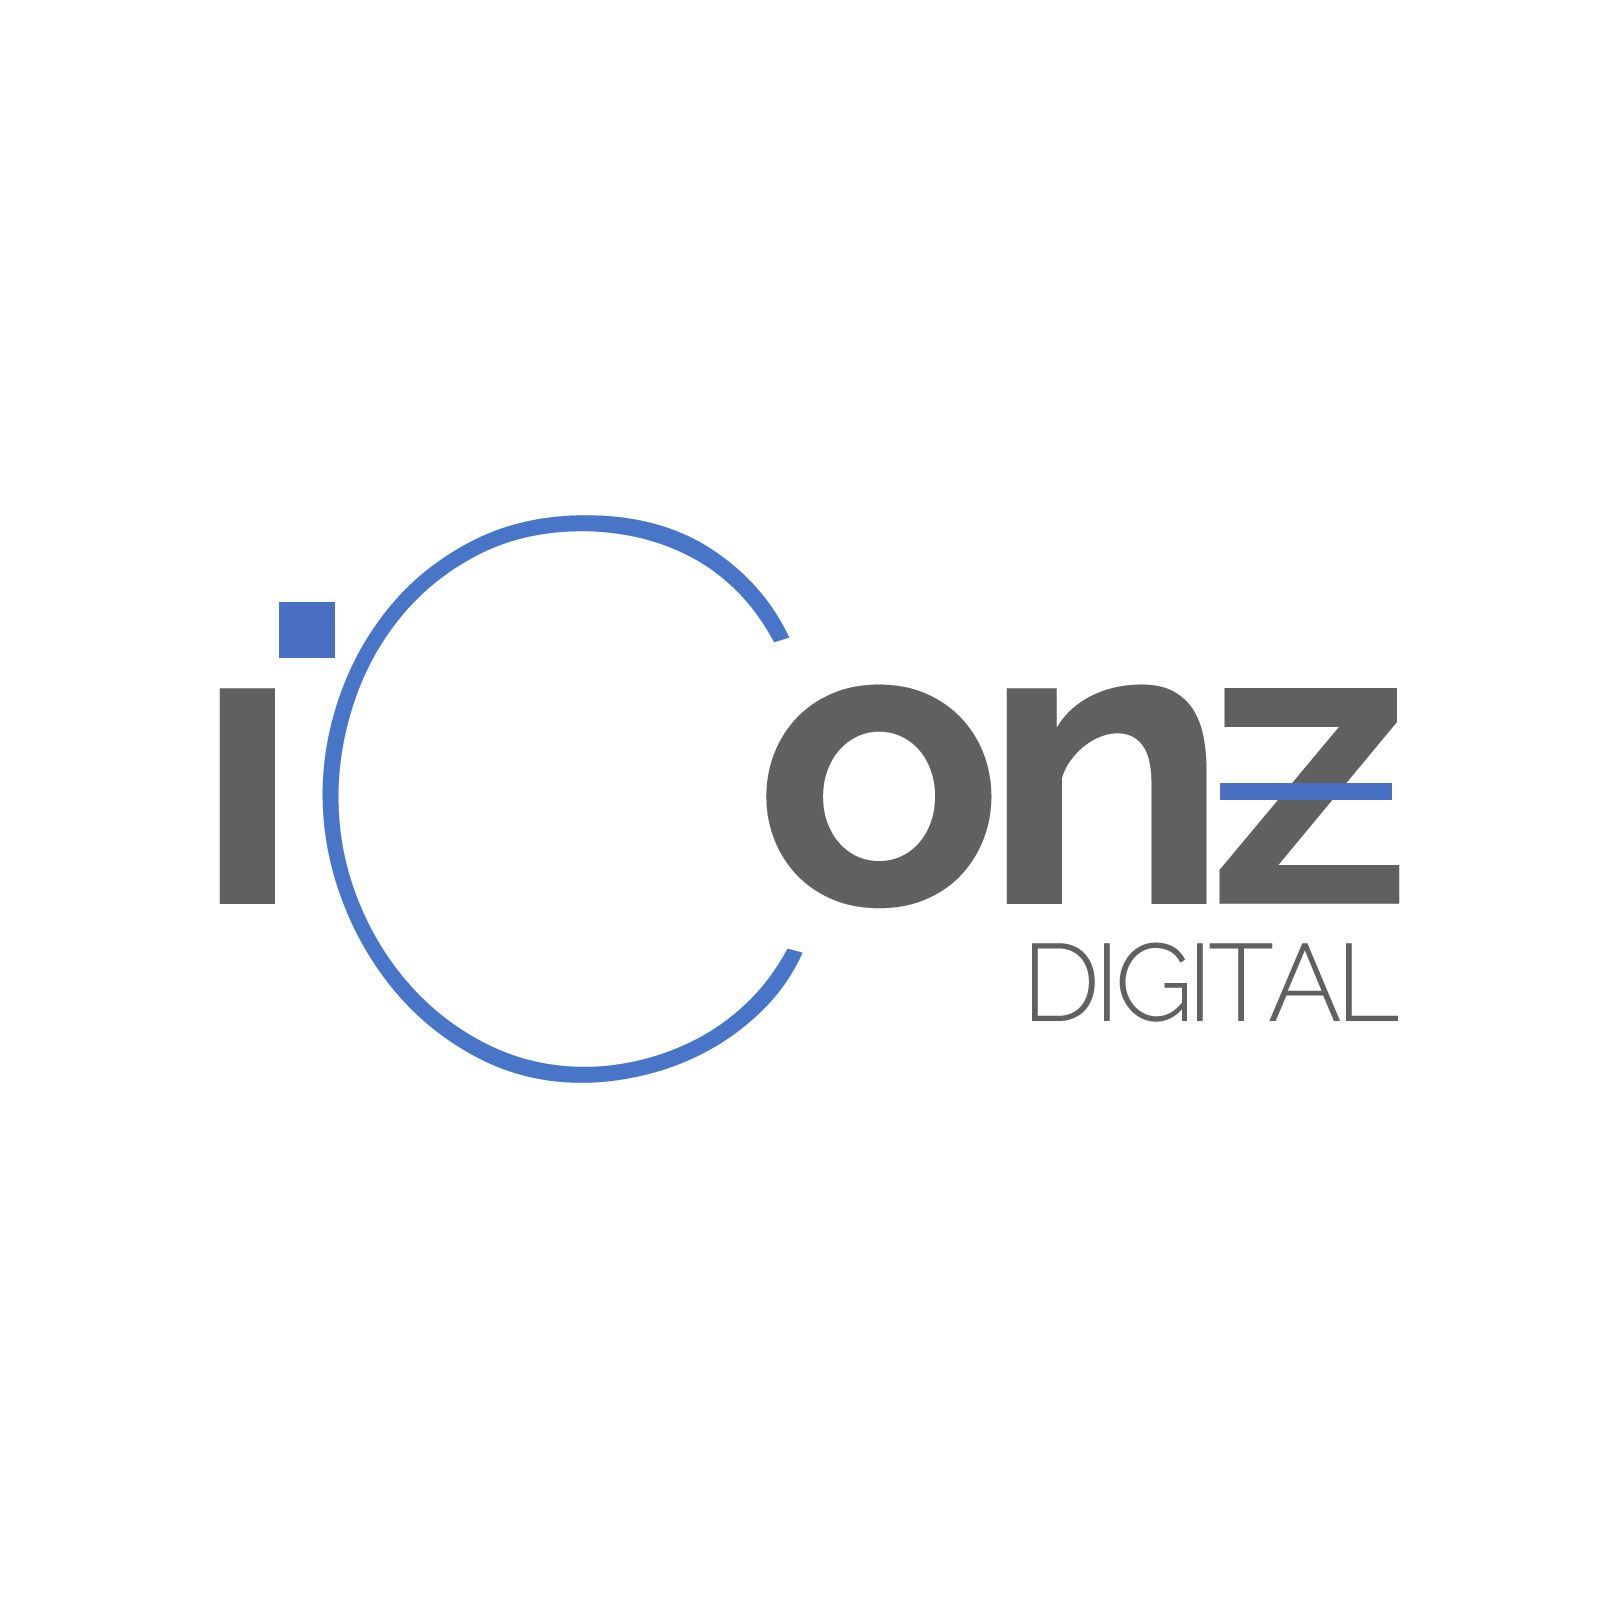 Iconz Pte Ltd Logo